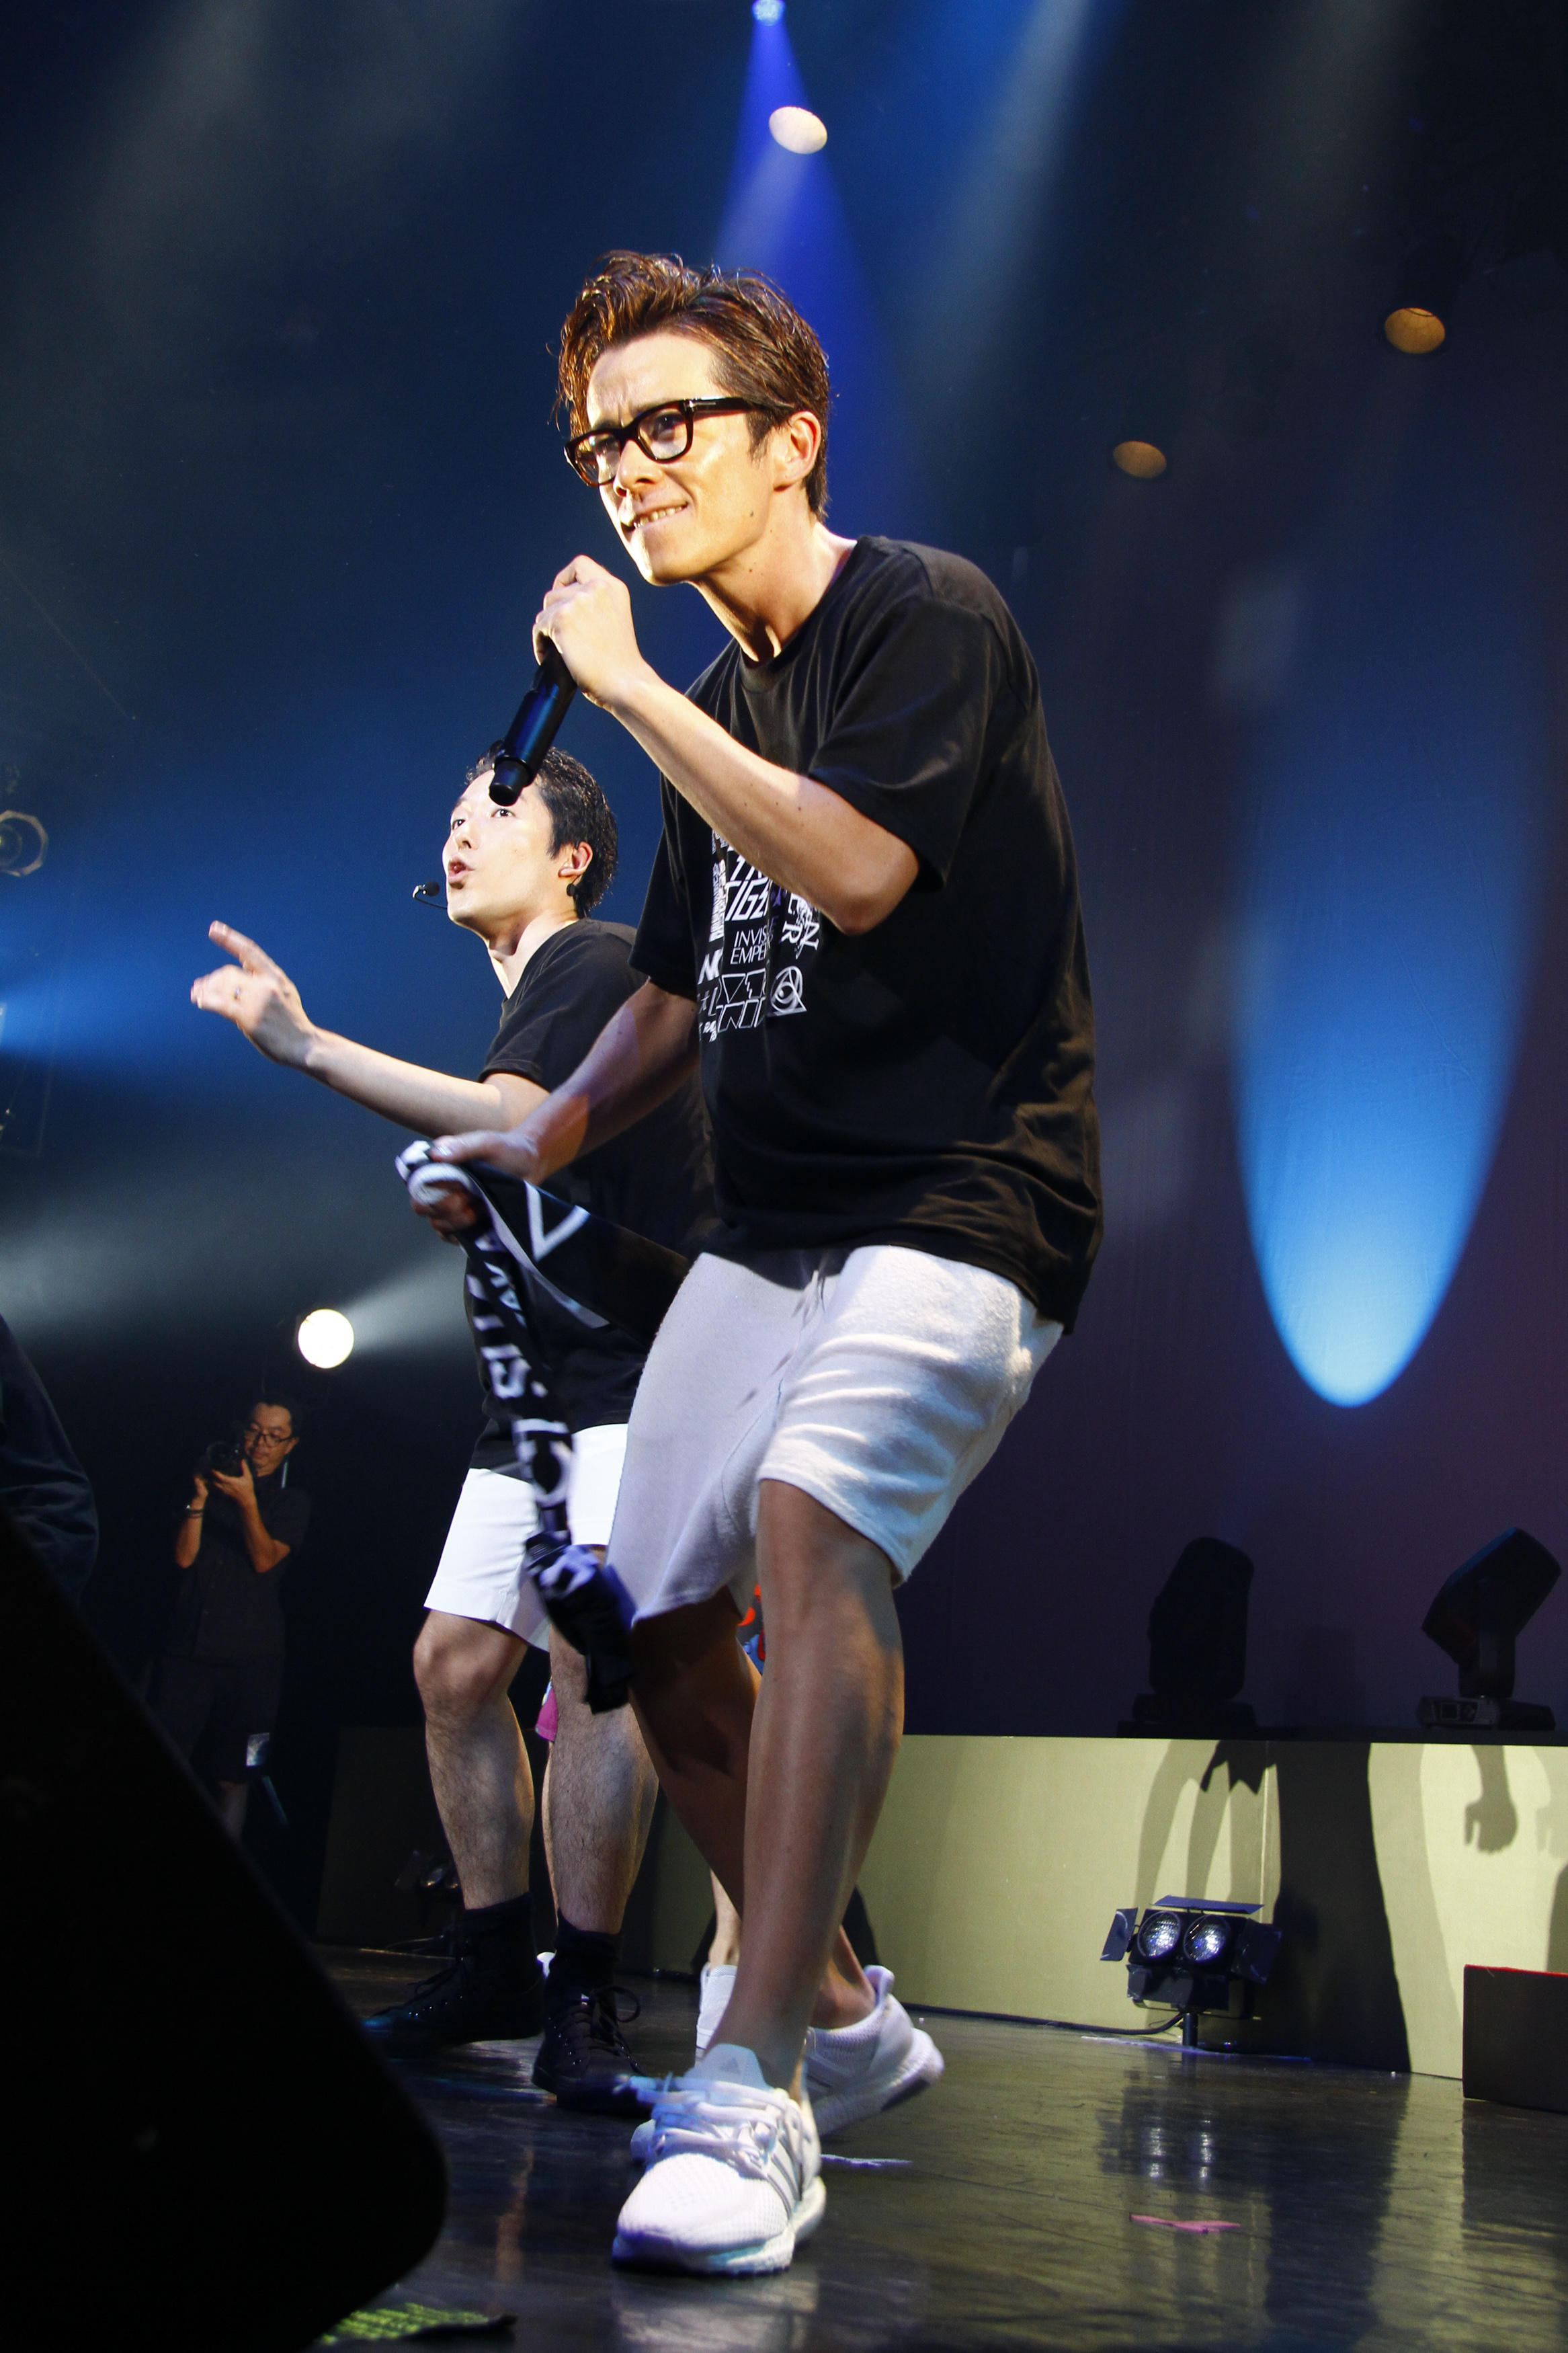 http://news.yoshimoto.co.jp/20160827114503-73c15c4d8c32435d19537743174c4929b17c8039.jpg